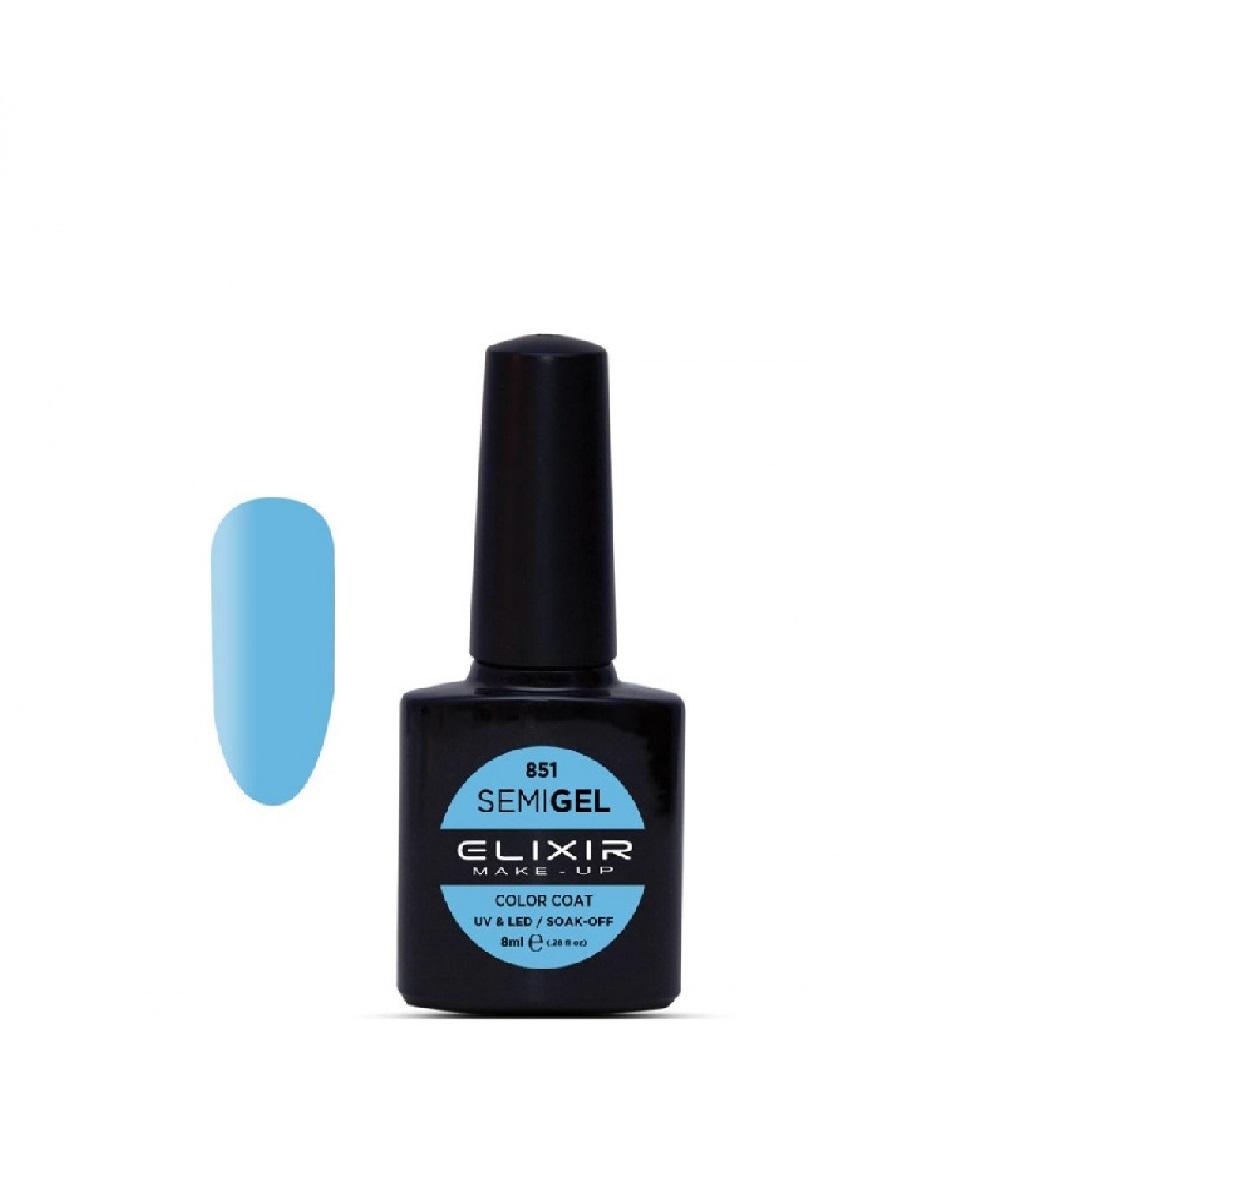 Elixir Make-up Semigel Ημιμόνιμο Βερνίκι No851 Bondi Blue 8ml